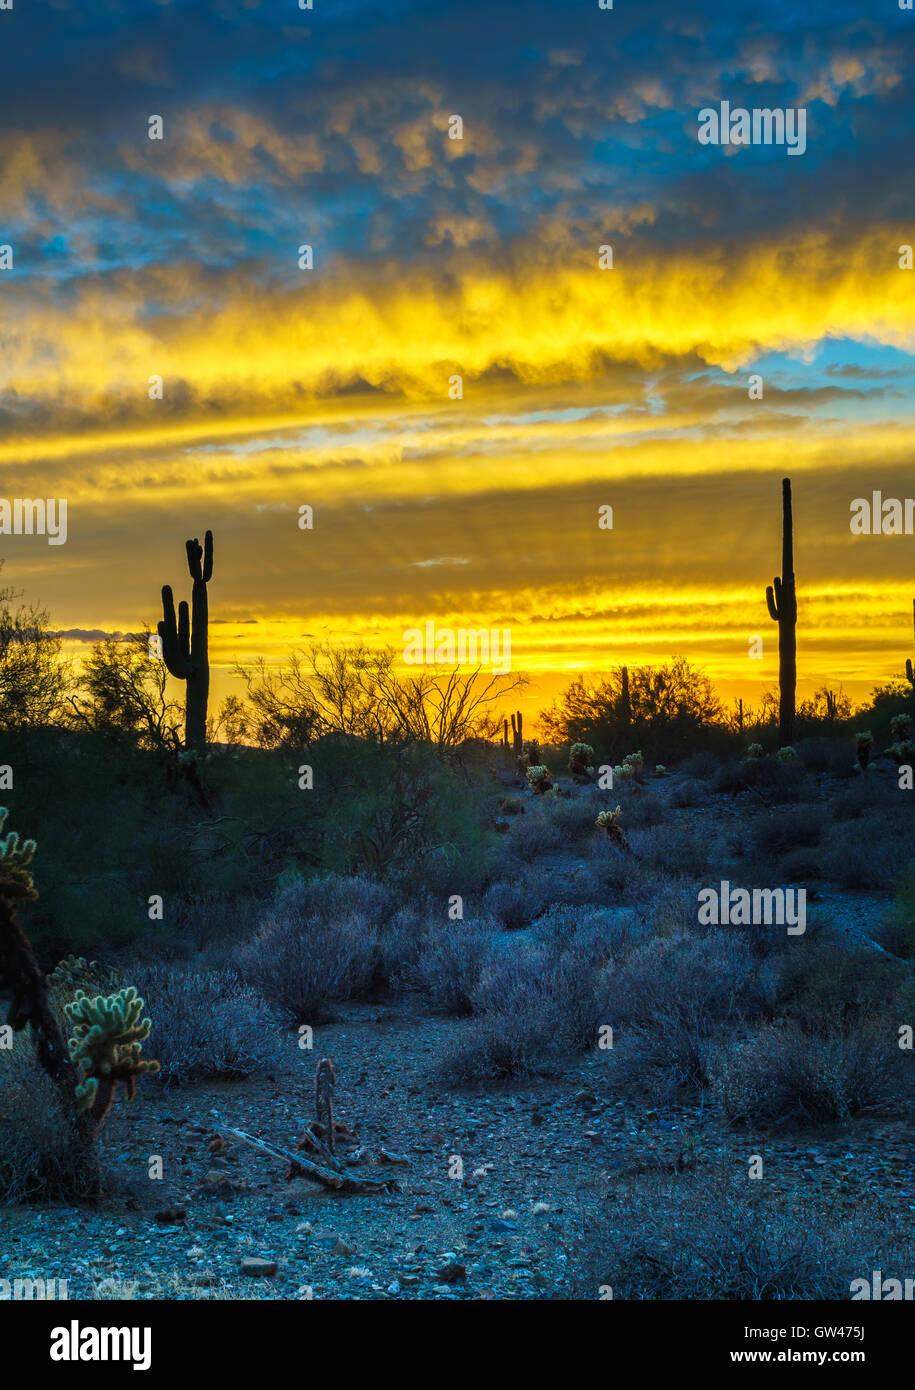 Phoenix arizona dating scene